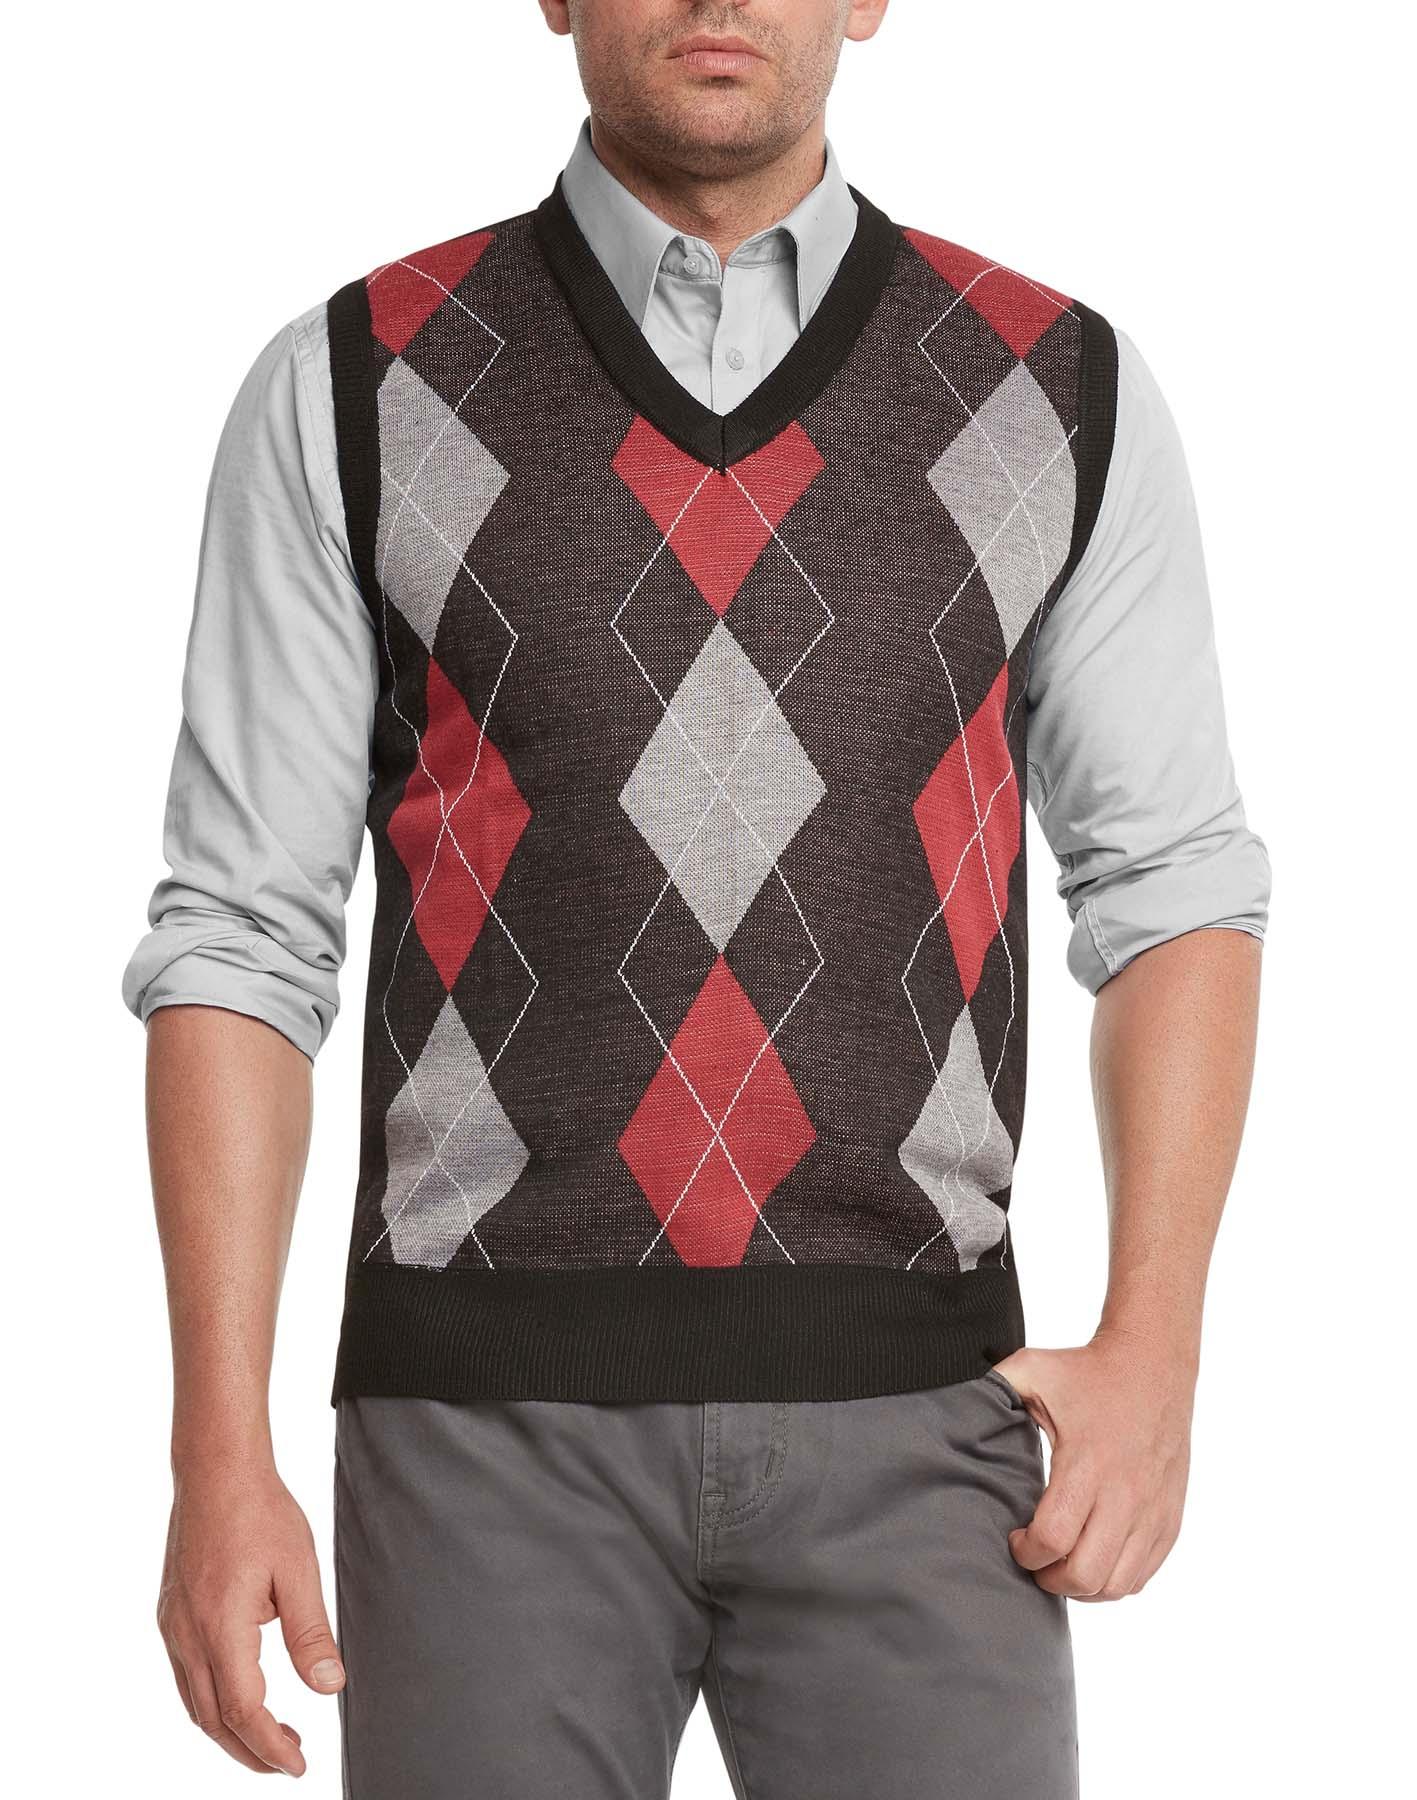 True Rock Men's Argyle V-neck Sweater Vest 2xl Black/red/gray | eBay